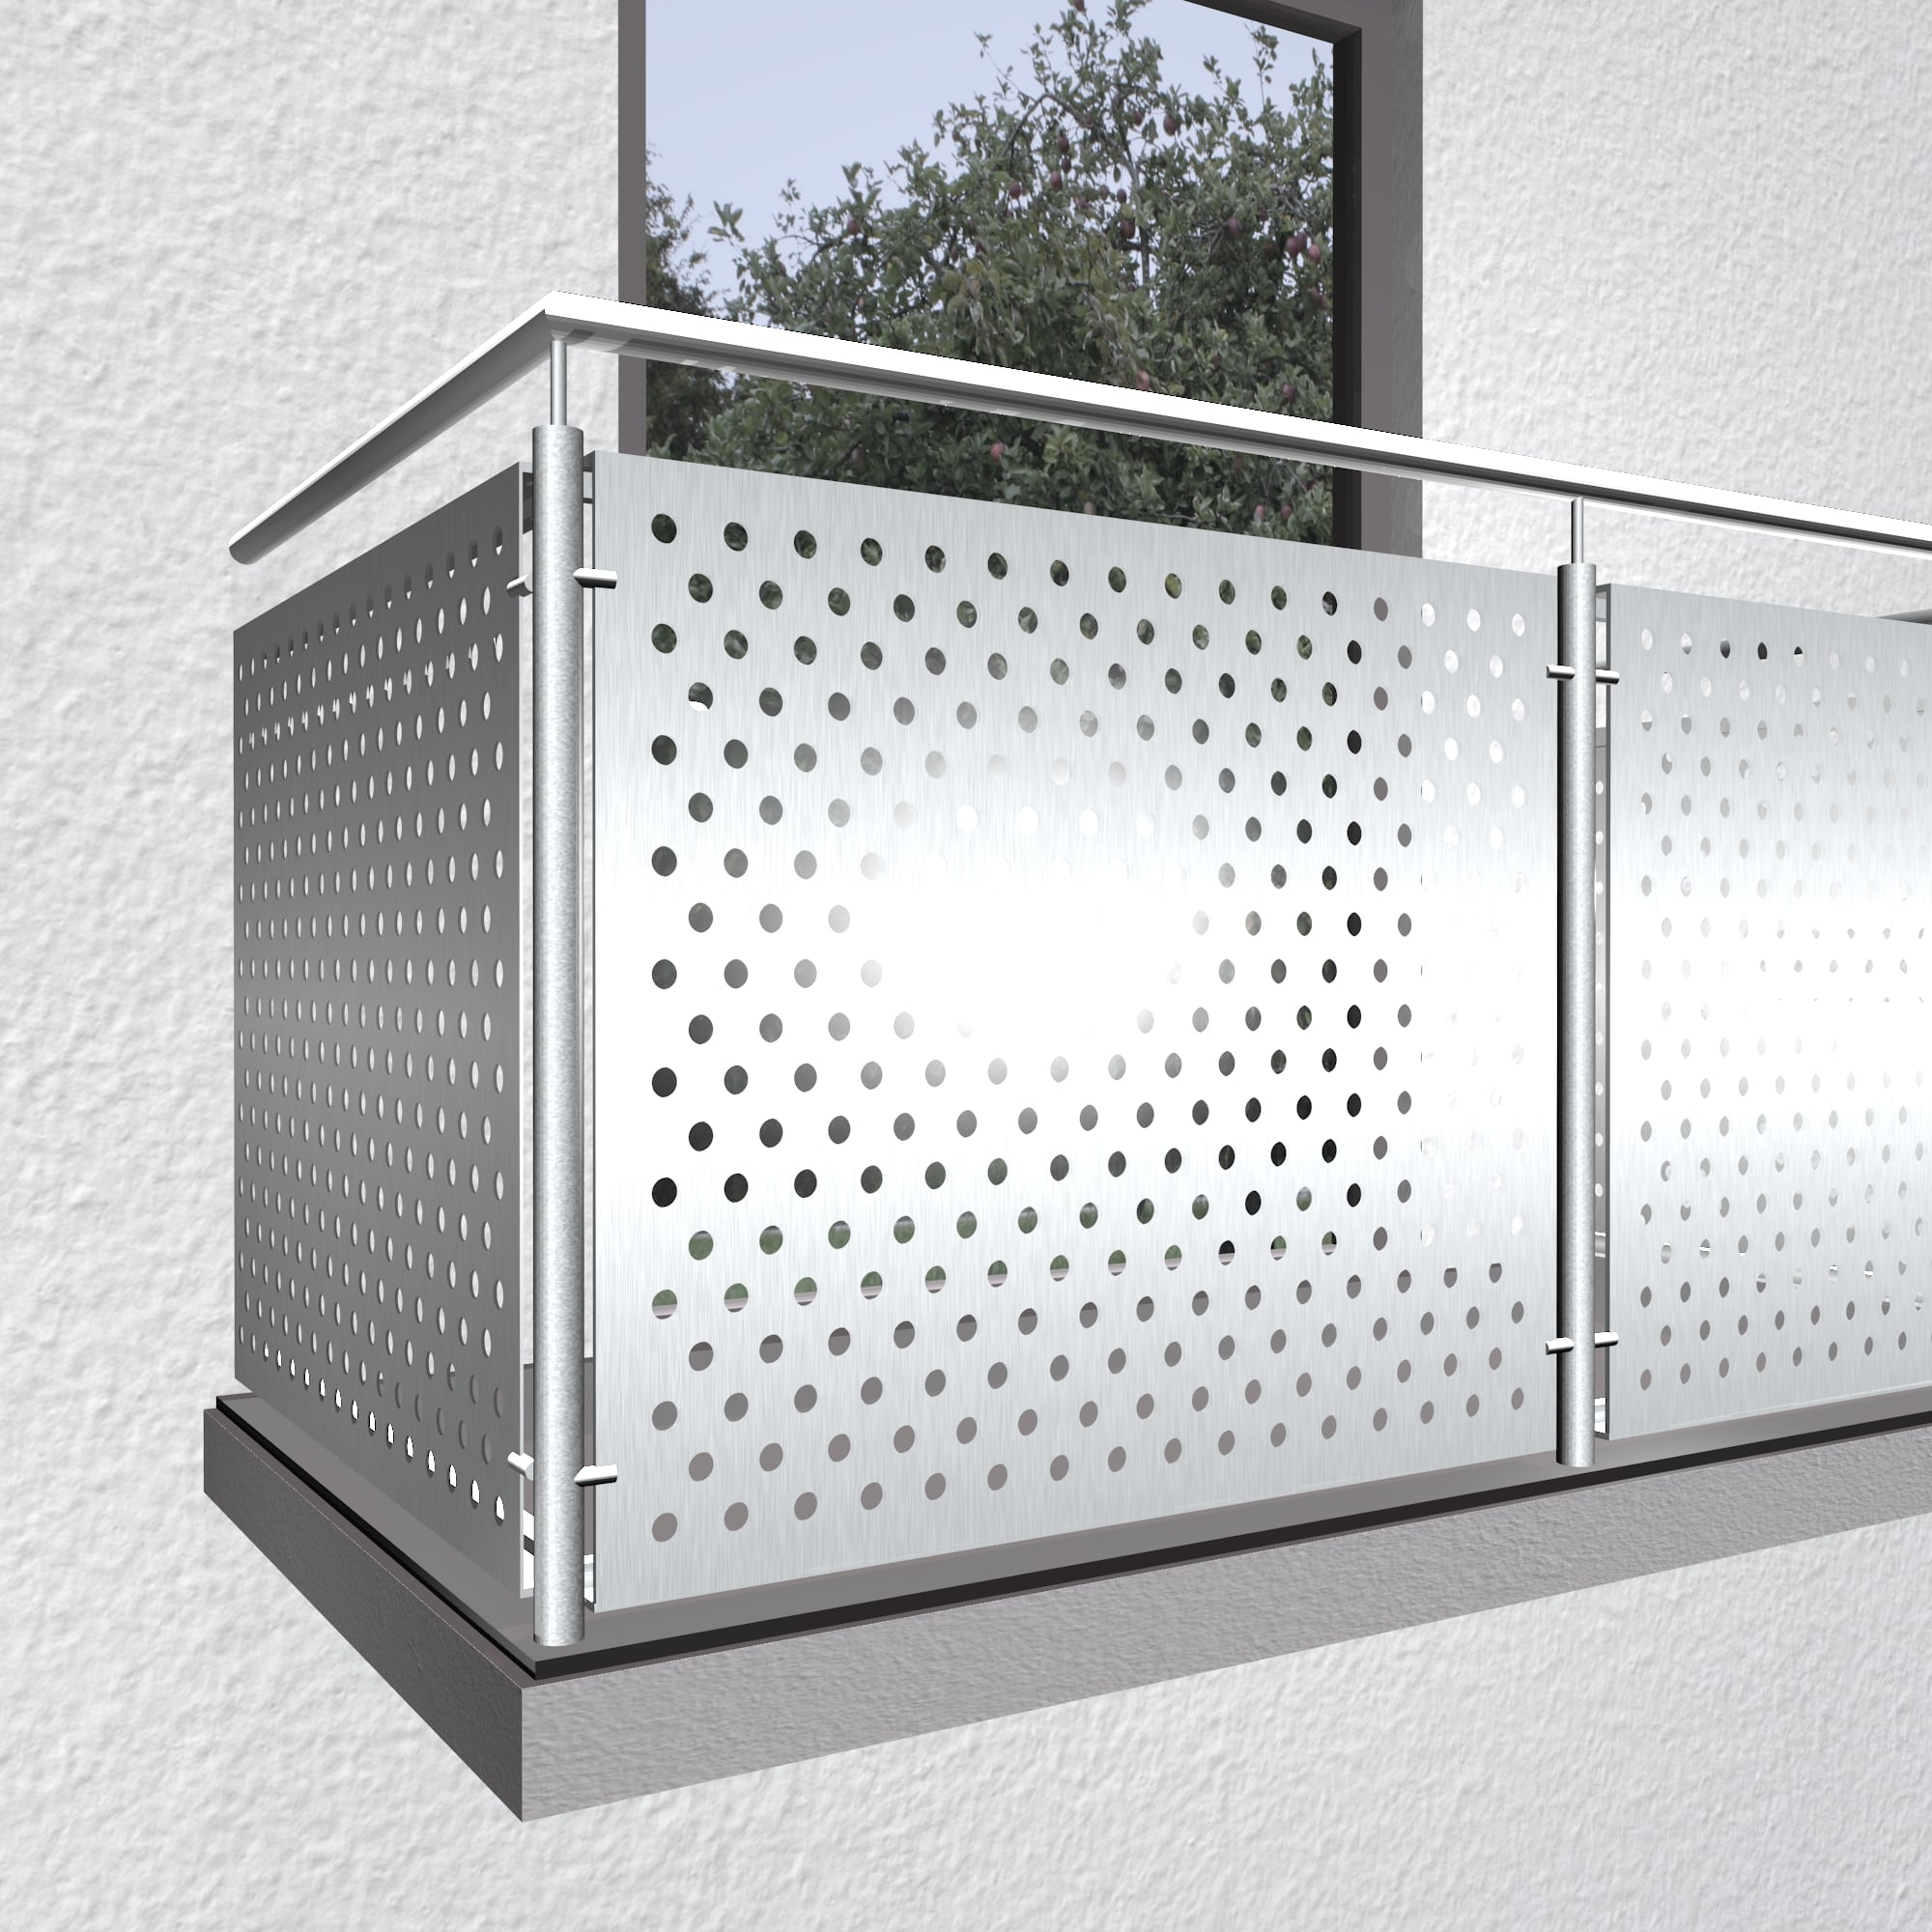 Balkonverkleidung Aluminium RL VE